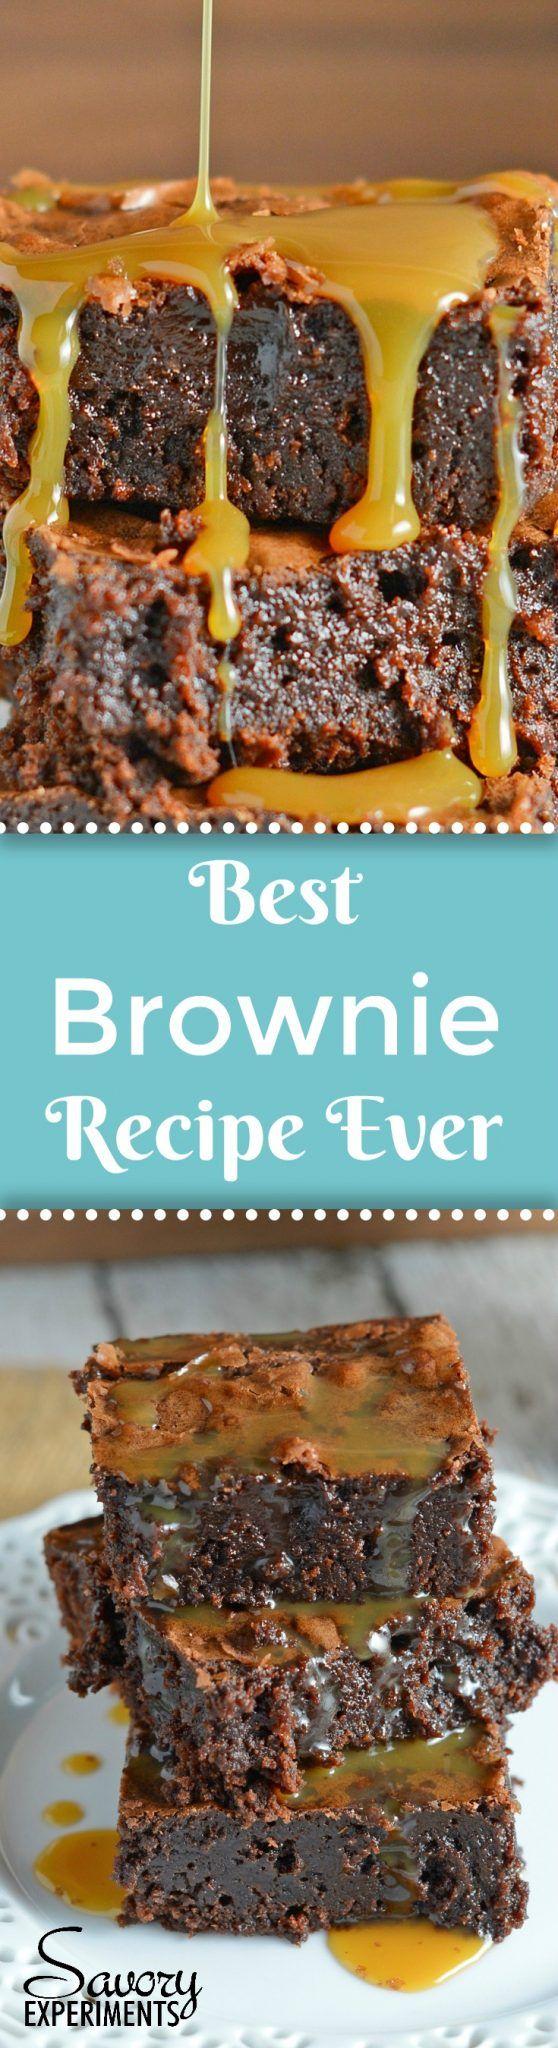 87 best Best Sweet Recipes images on Pinterest